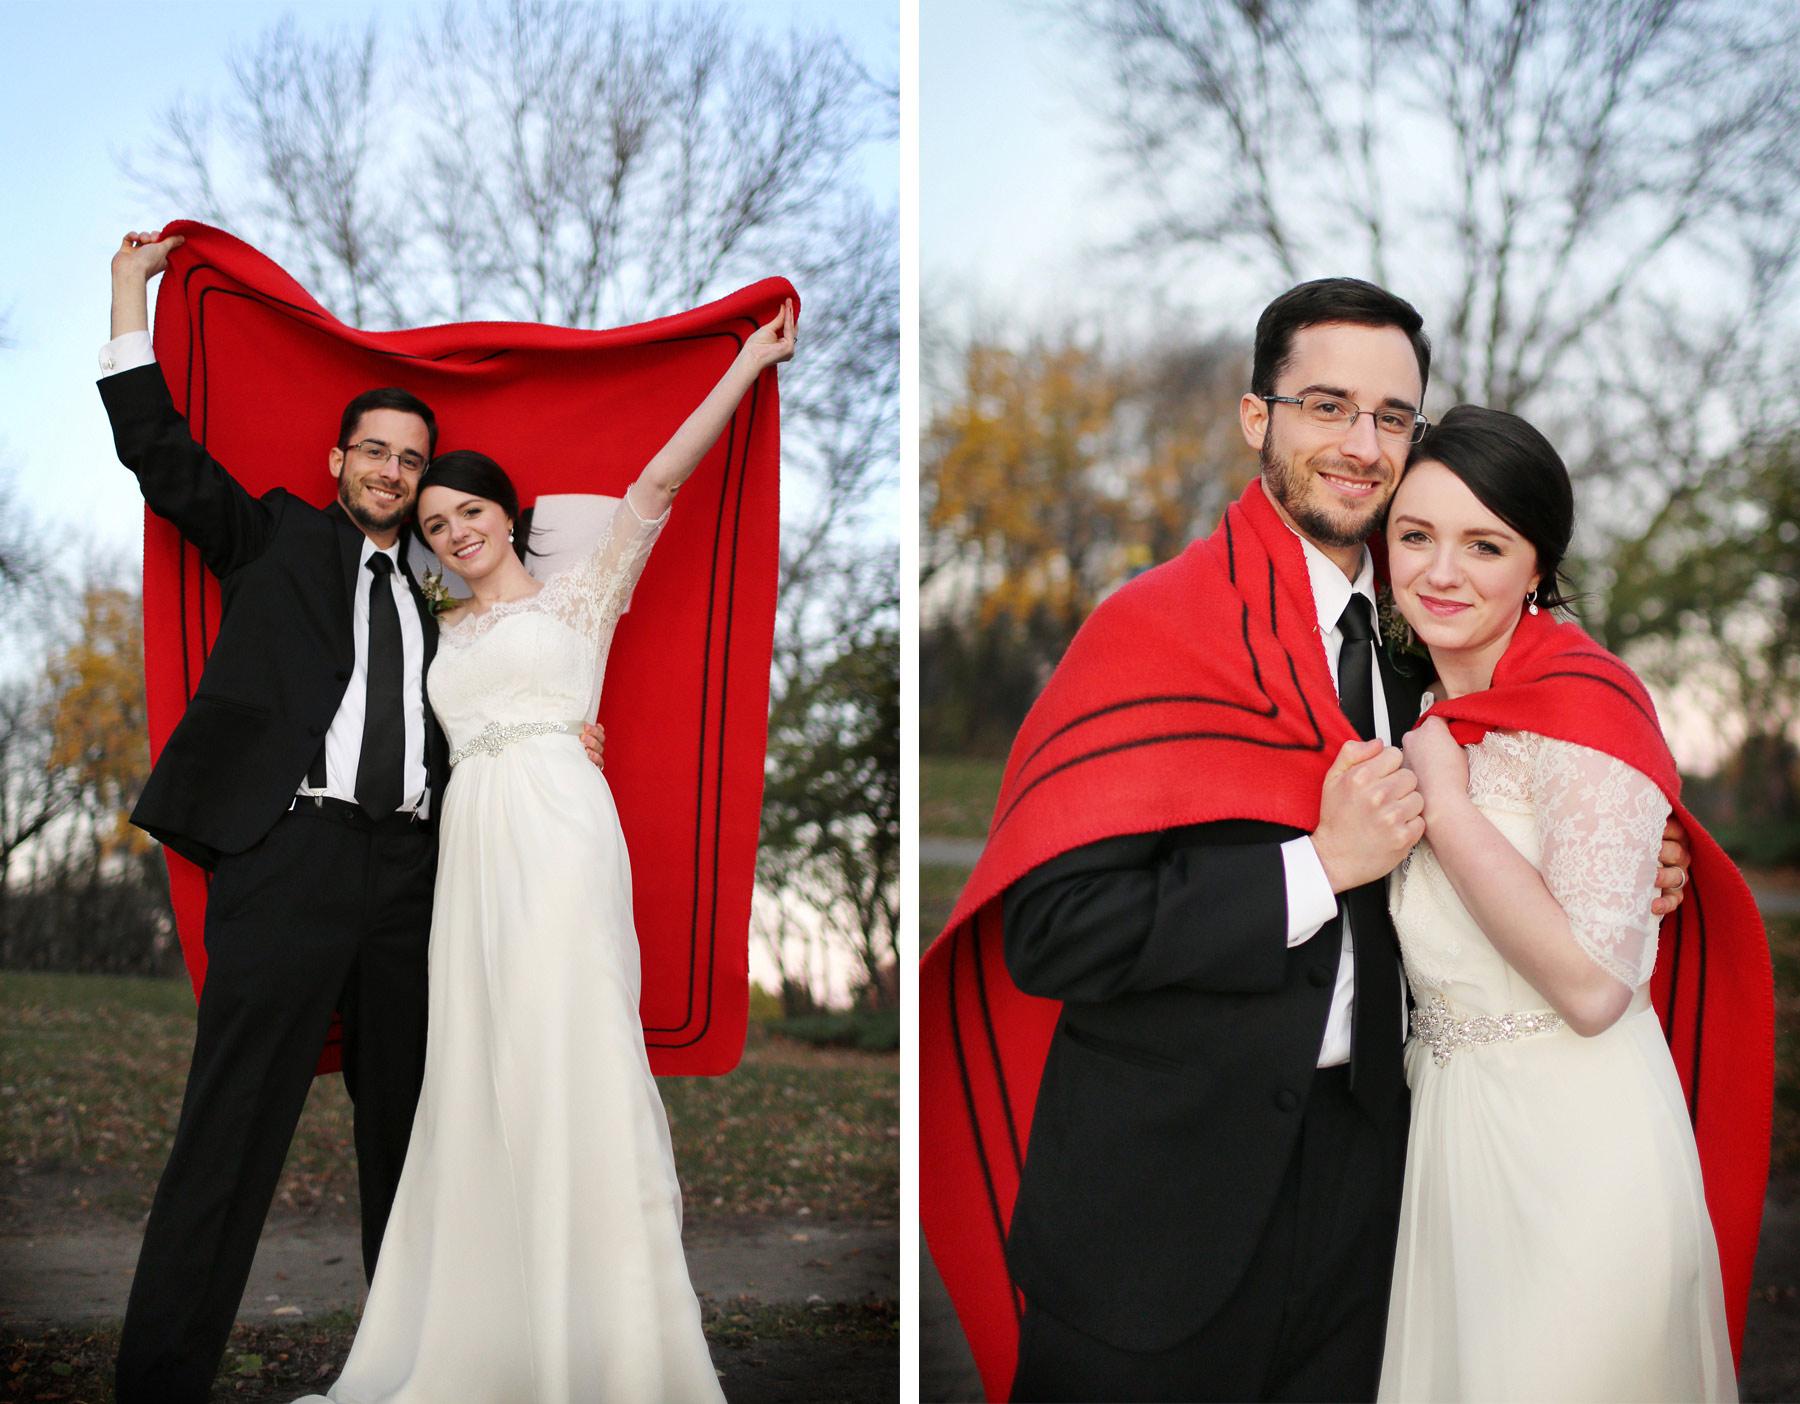 14-Minneapolis-Minnesota-Wedding-Photography-by-Vick-Photography-Autumn-Sarah-and-Patrick.jpg